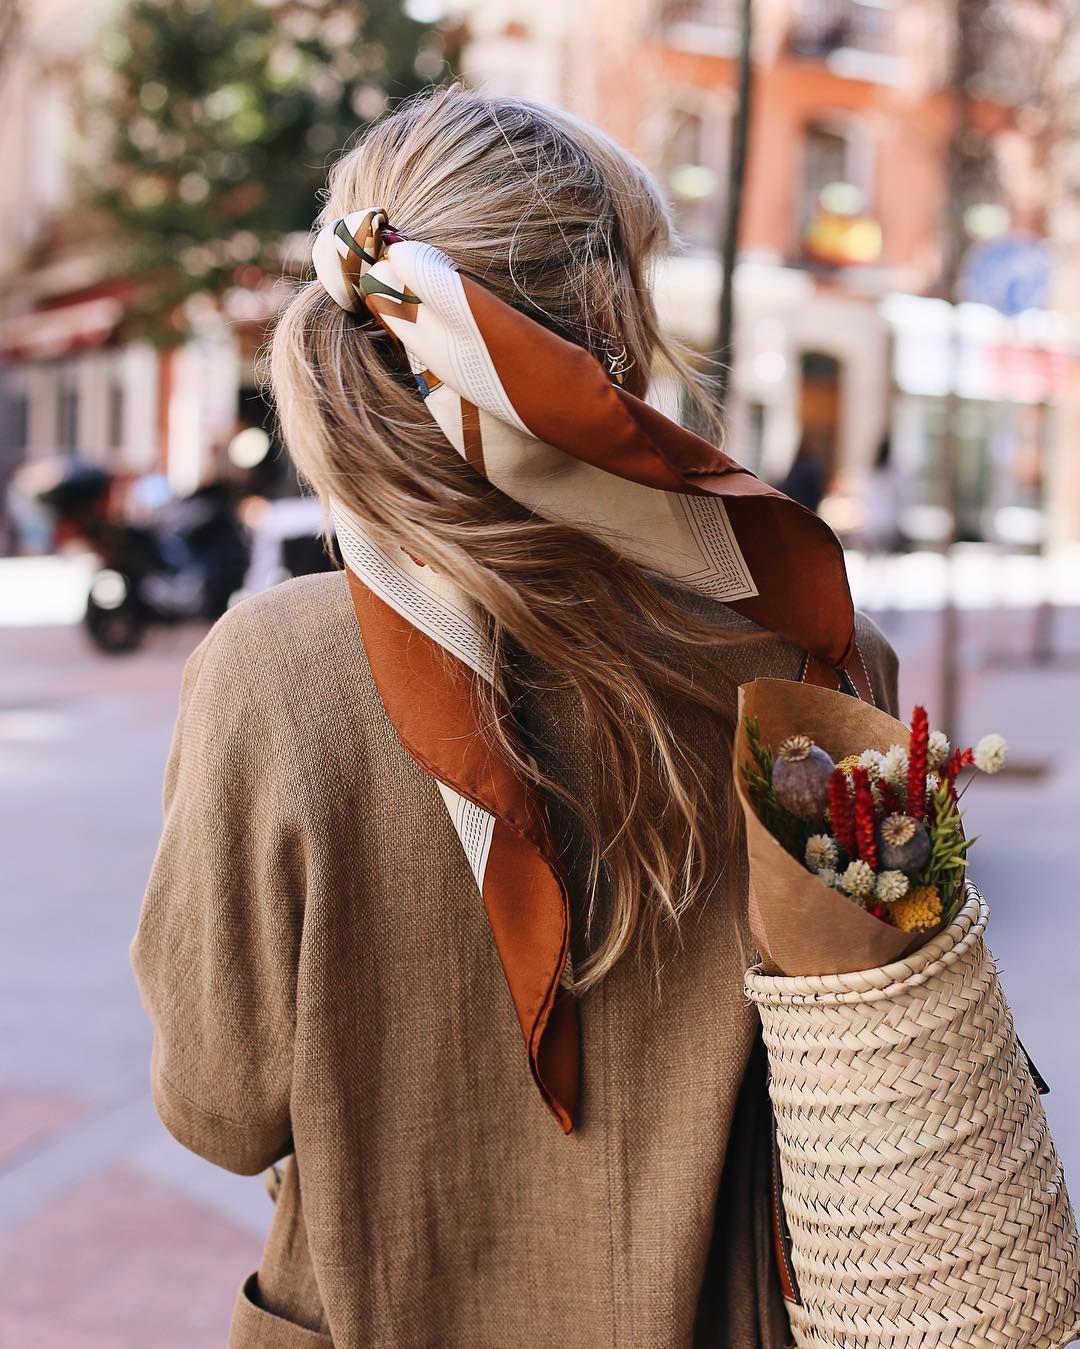 55 Scarf hairstyles ideas | scarf hairstyles, hair styles, hair beauty